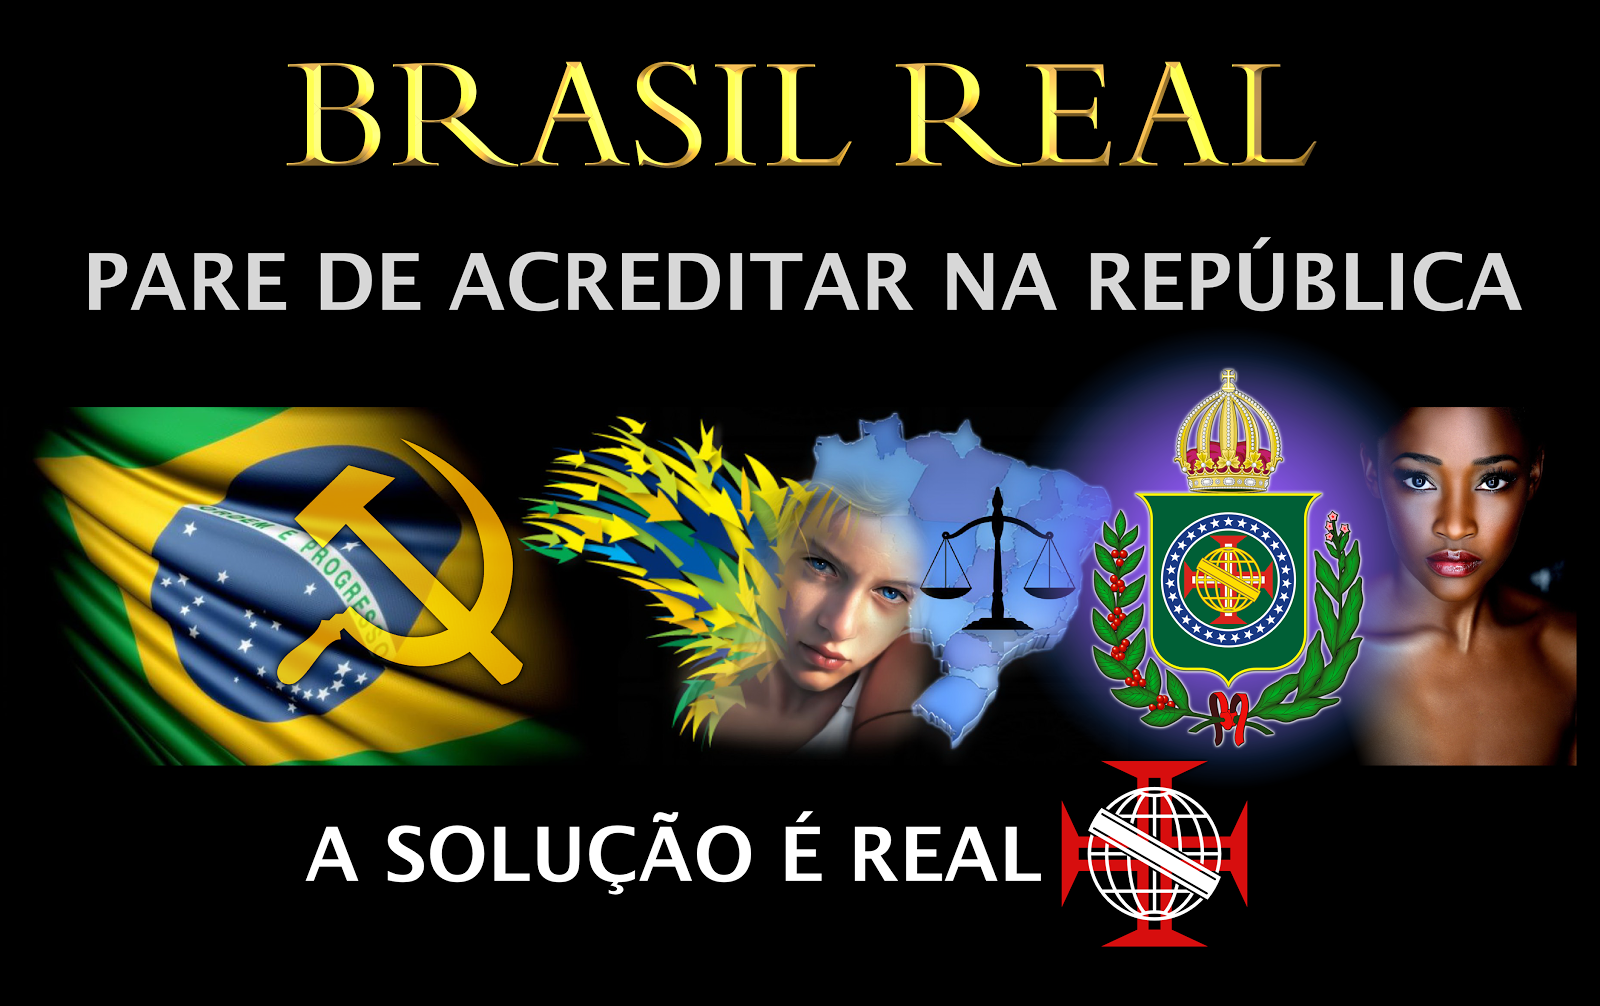 BRASIL REAL